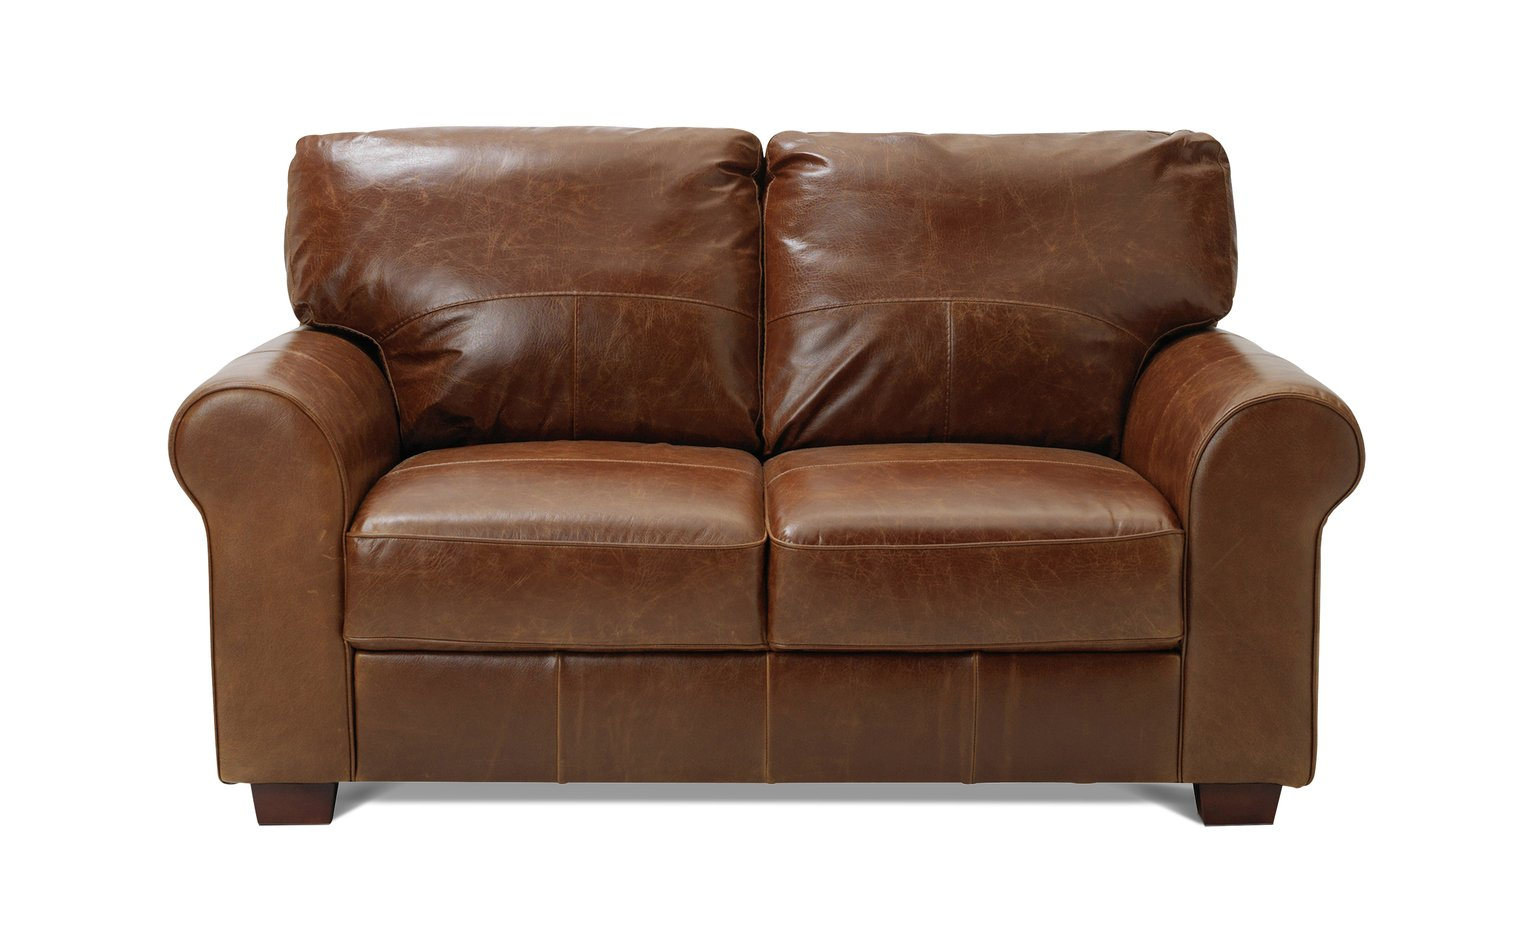 Heart Of House Salisbury 2 Seater Leather Sofa   Tan